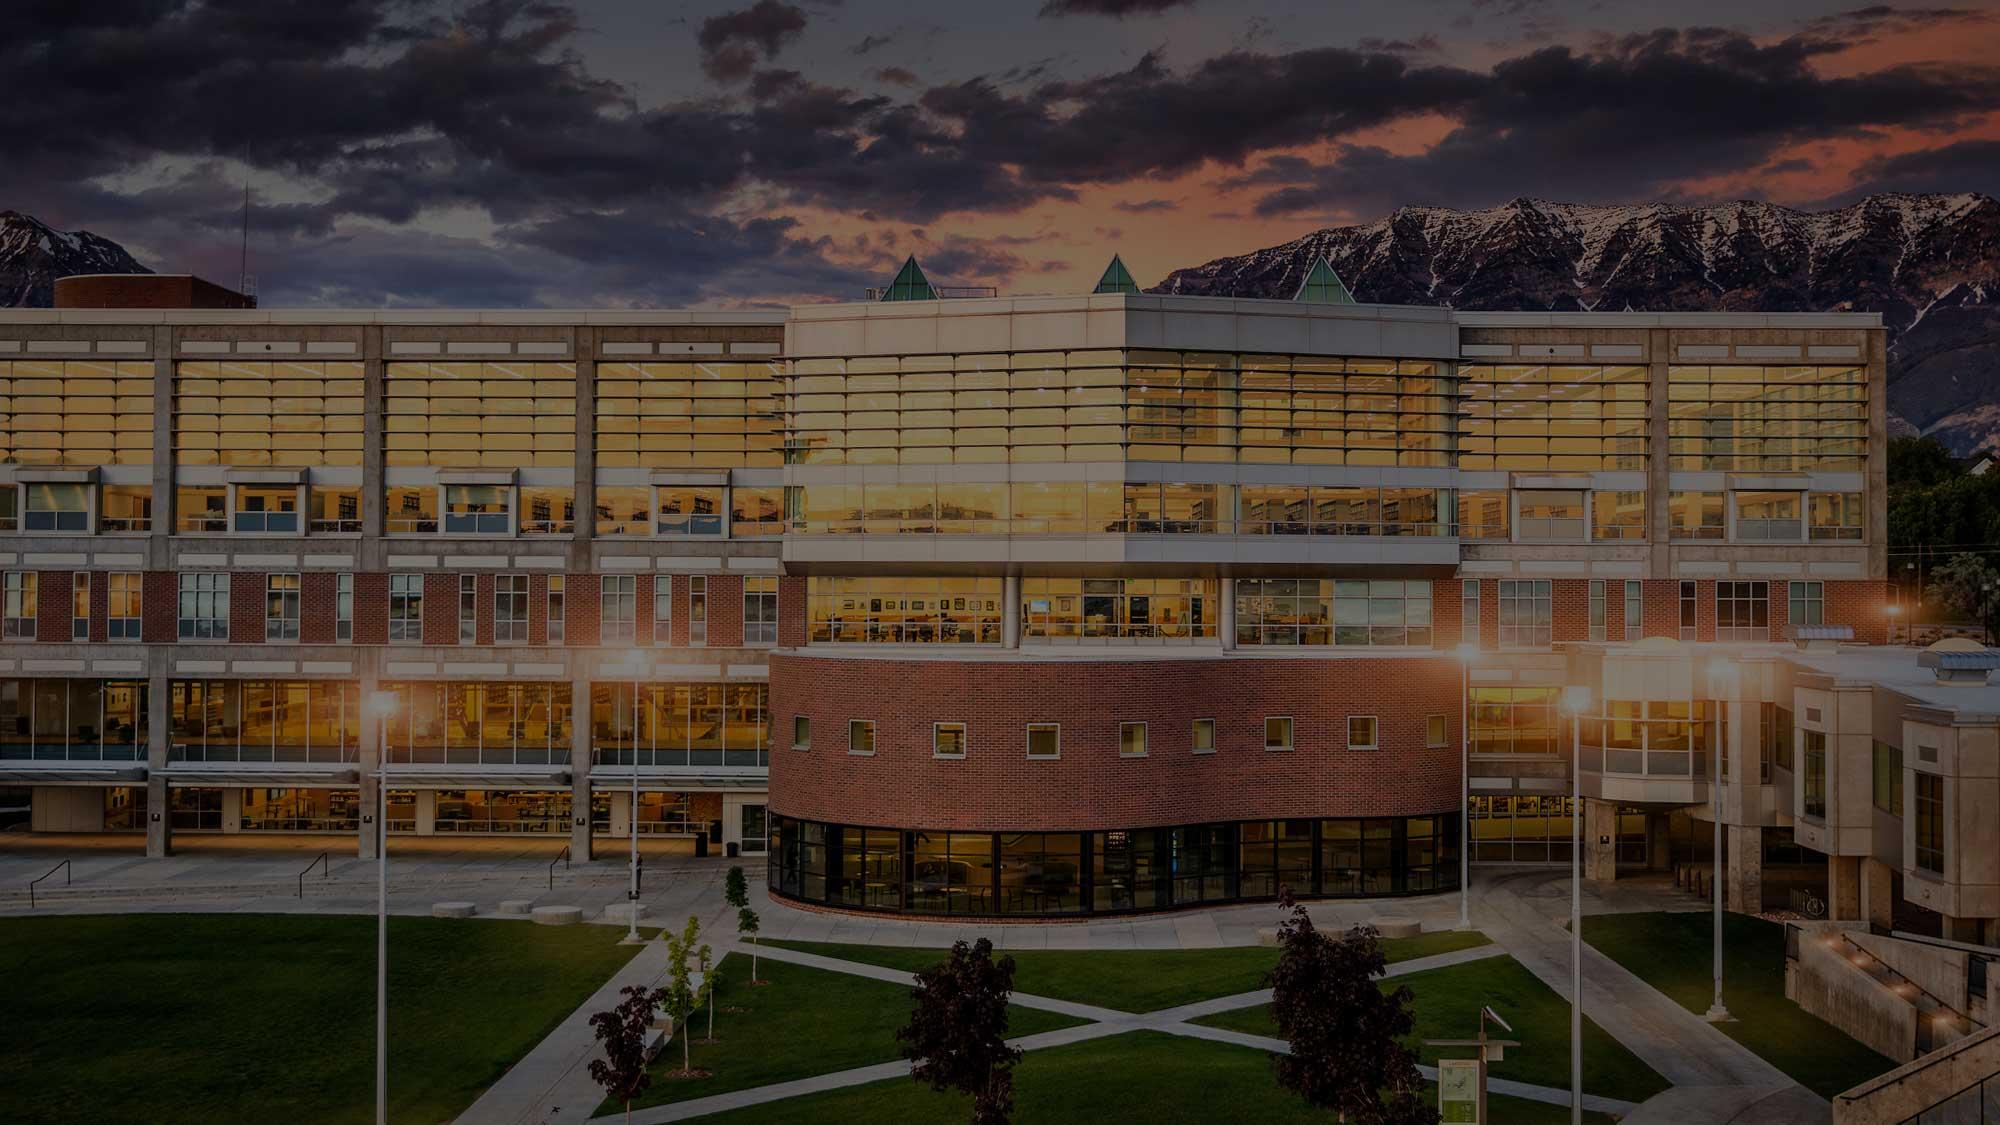 Uvu Fall 2022 Calendar.Pmslymtvryhqcm